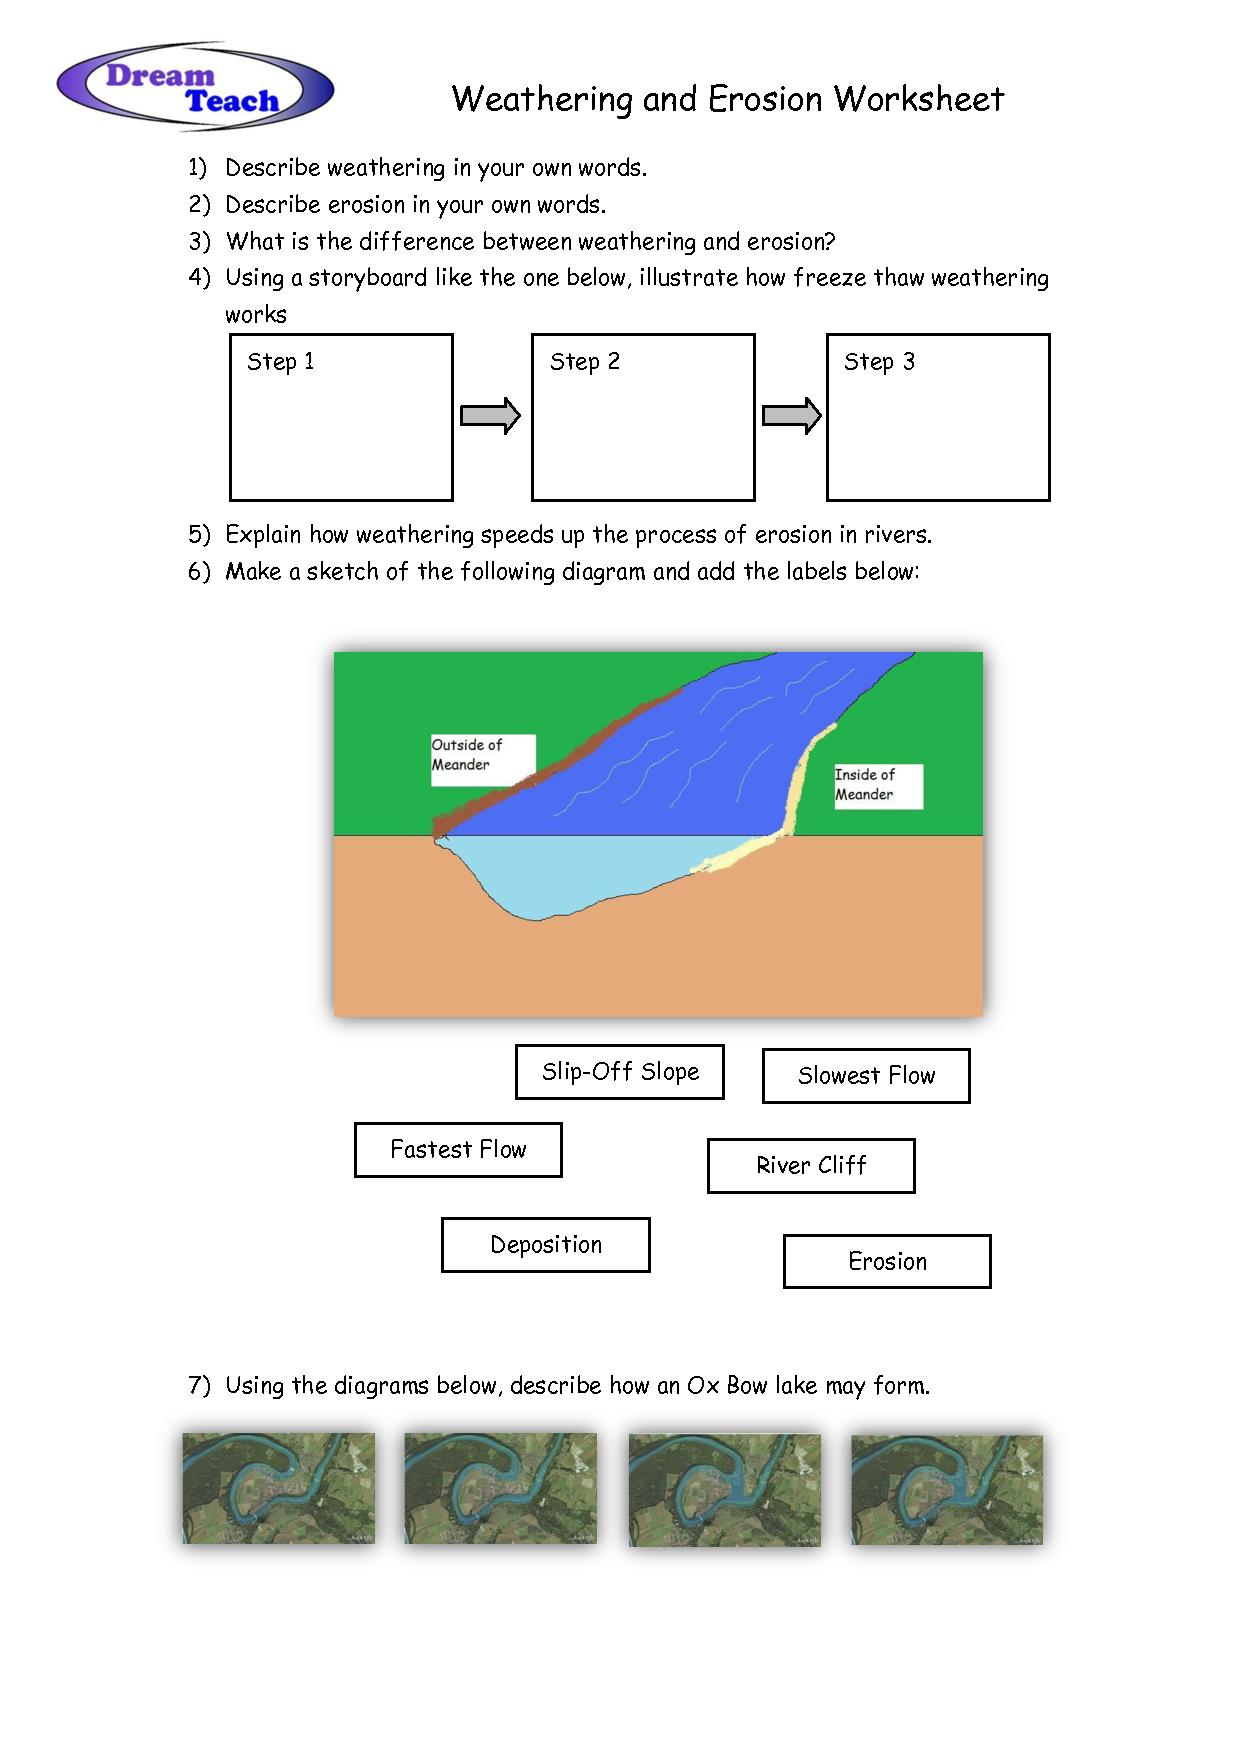 Weathering And Erosion Worksheet   Weathering and erosion [ 1754 x 1240 Pixel ]